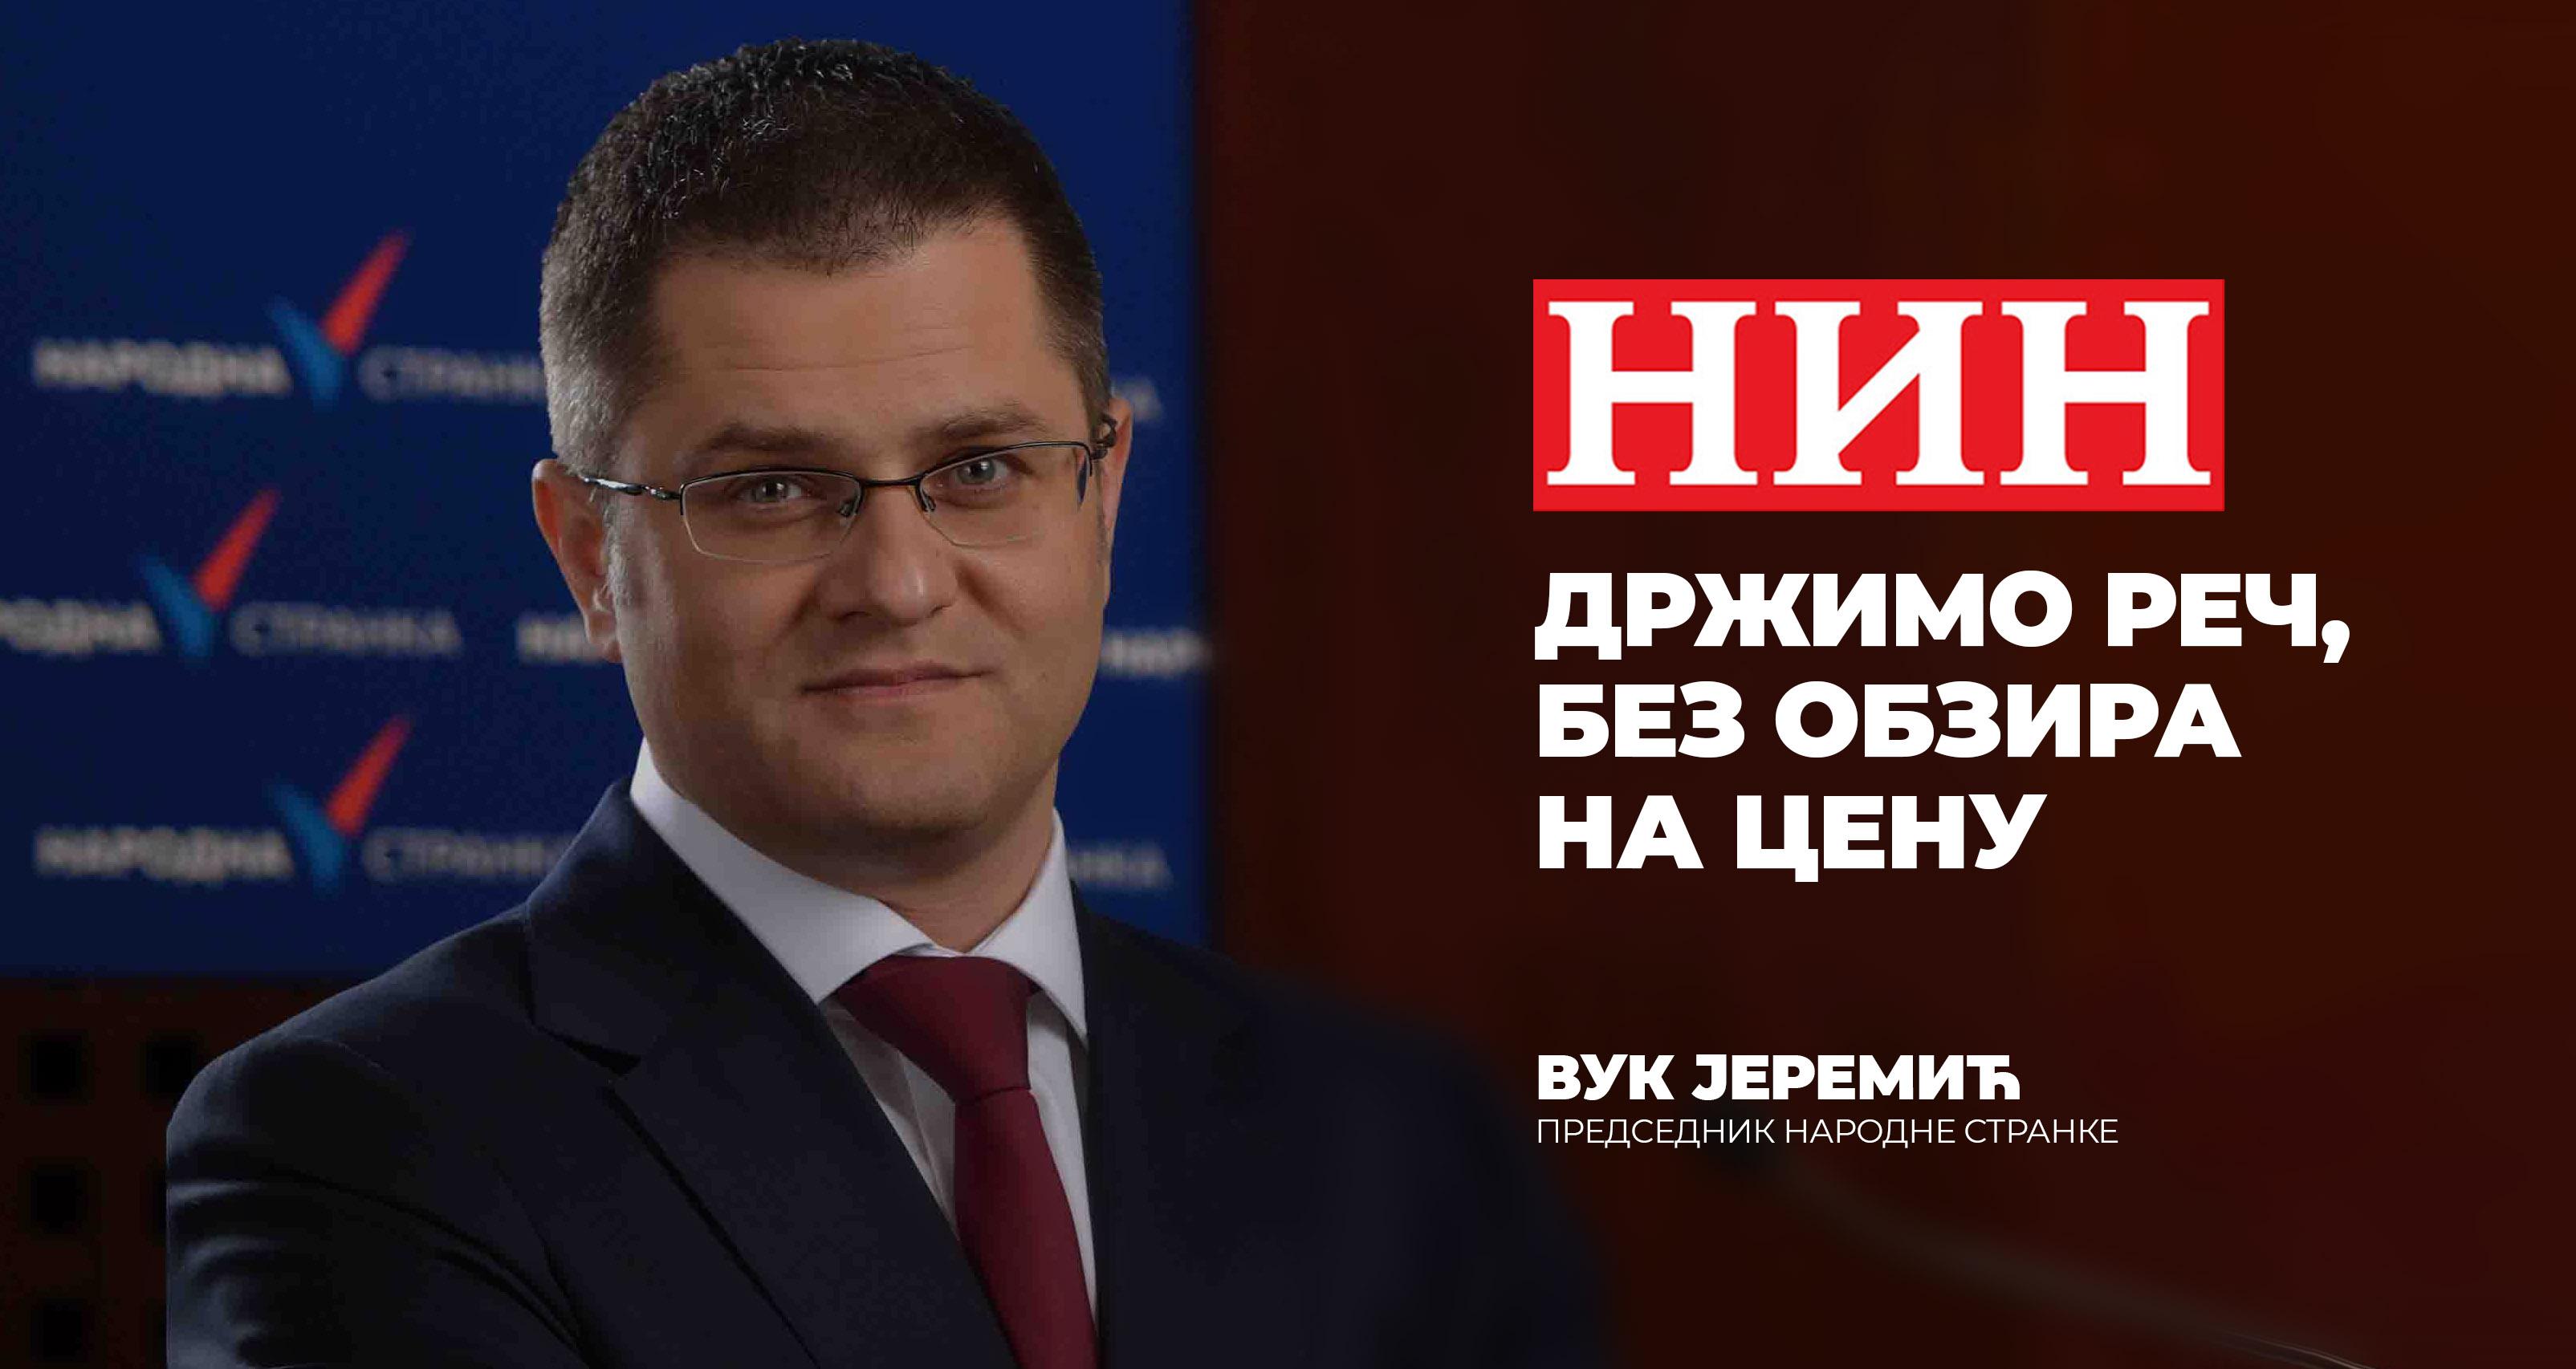 Јеремић за НИН: Држимо реч, без обзира на цену